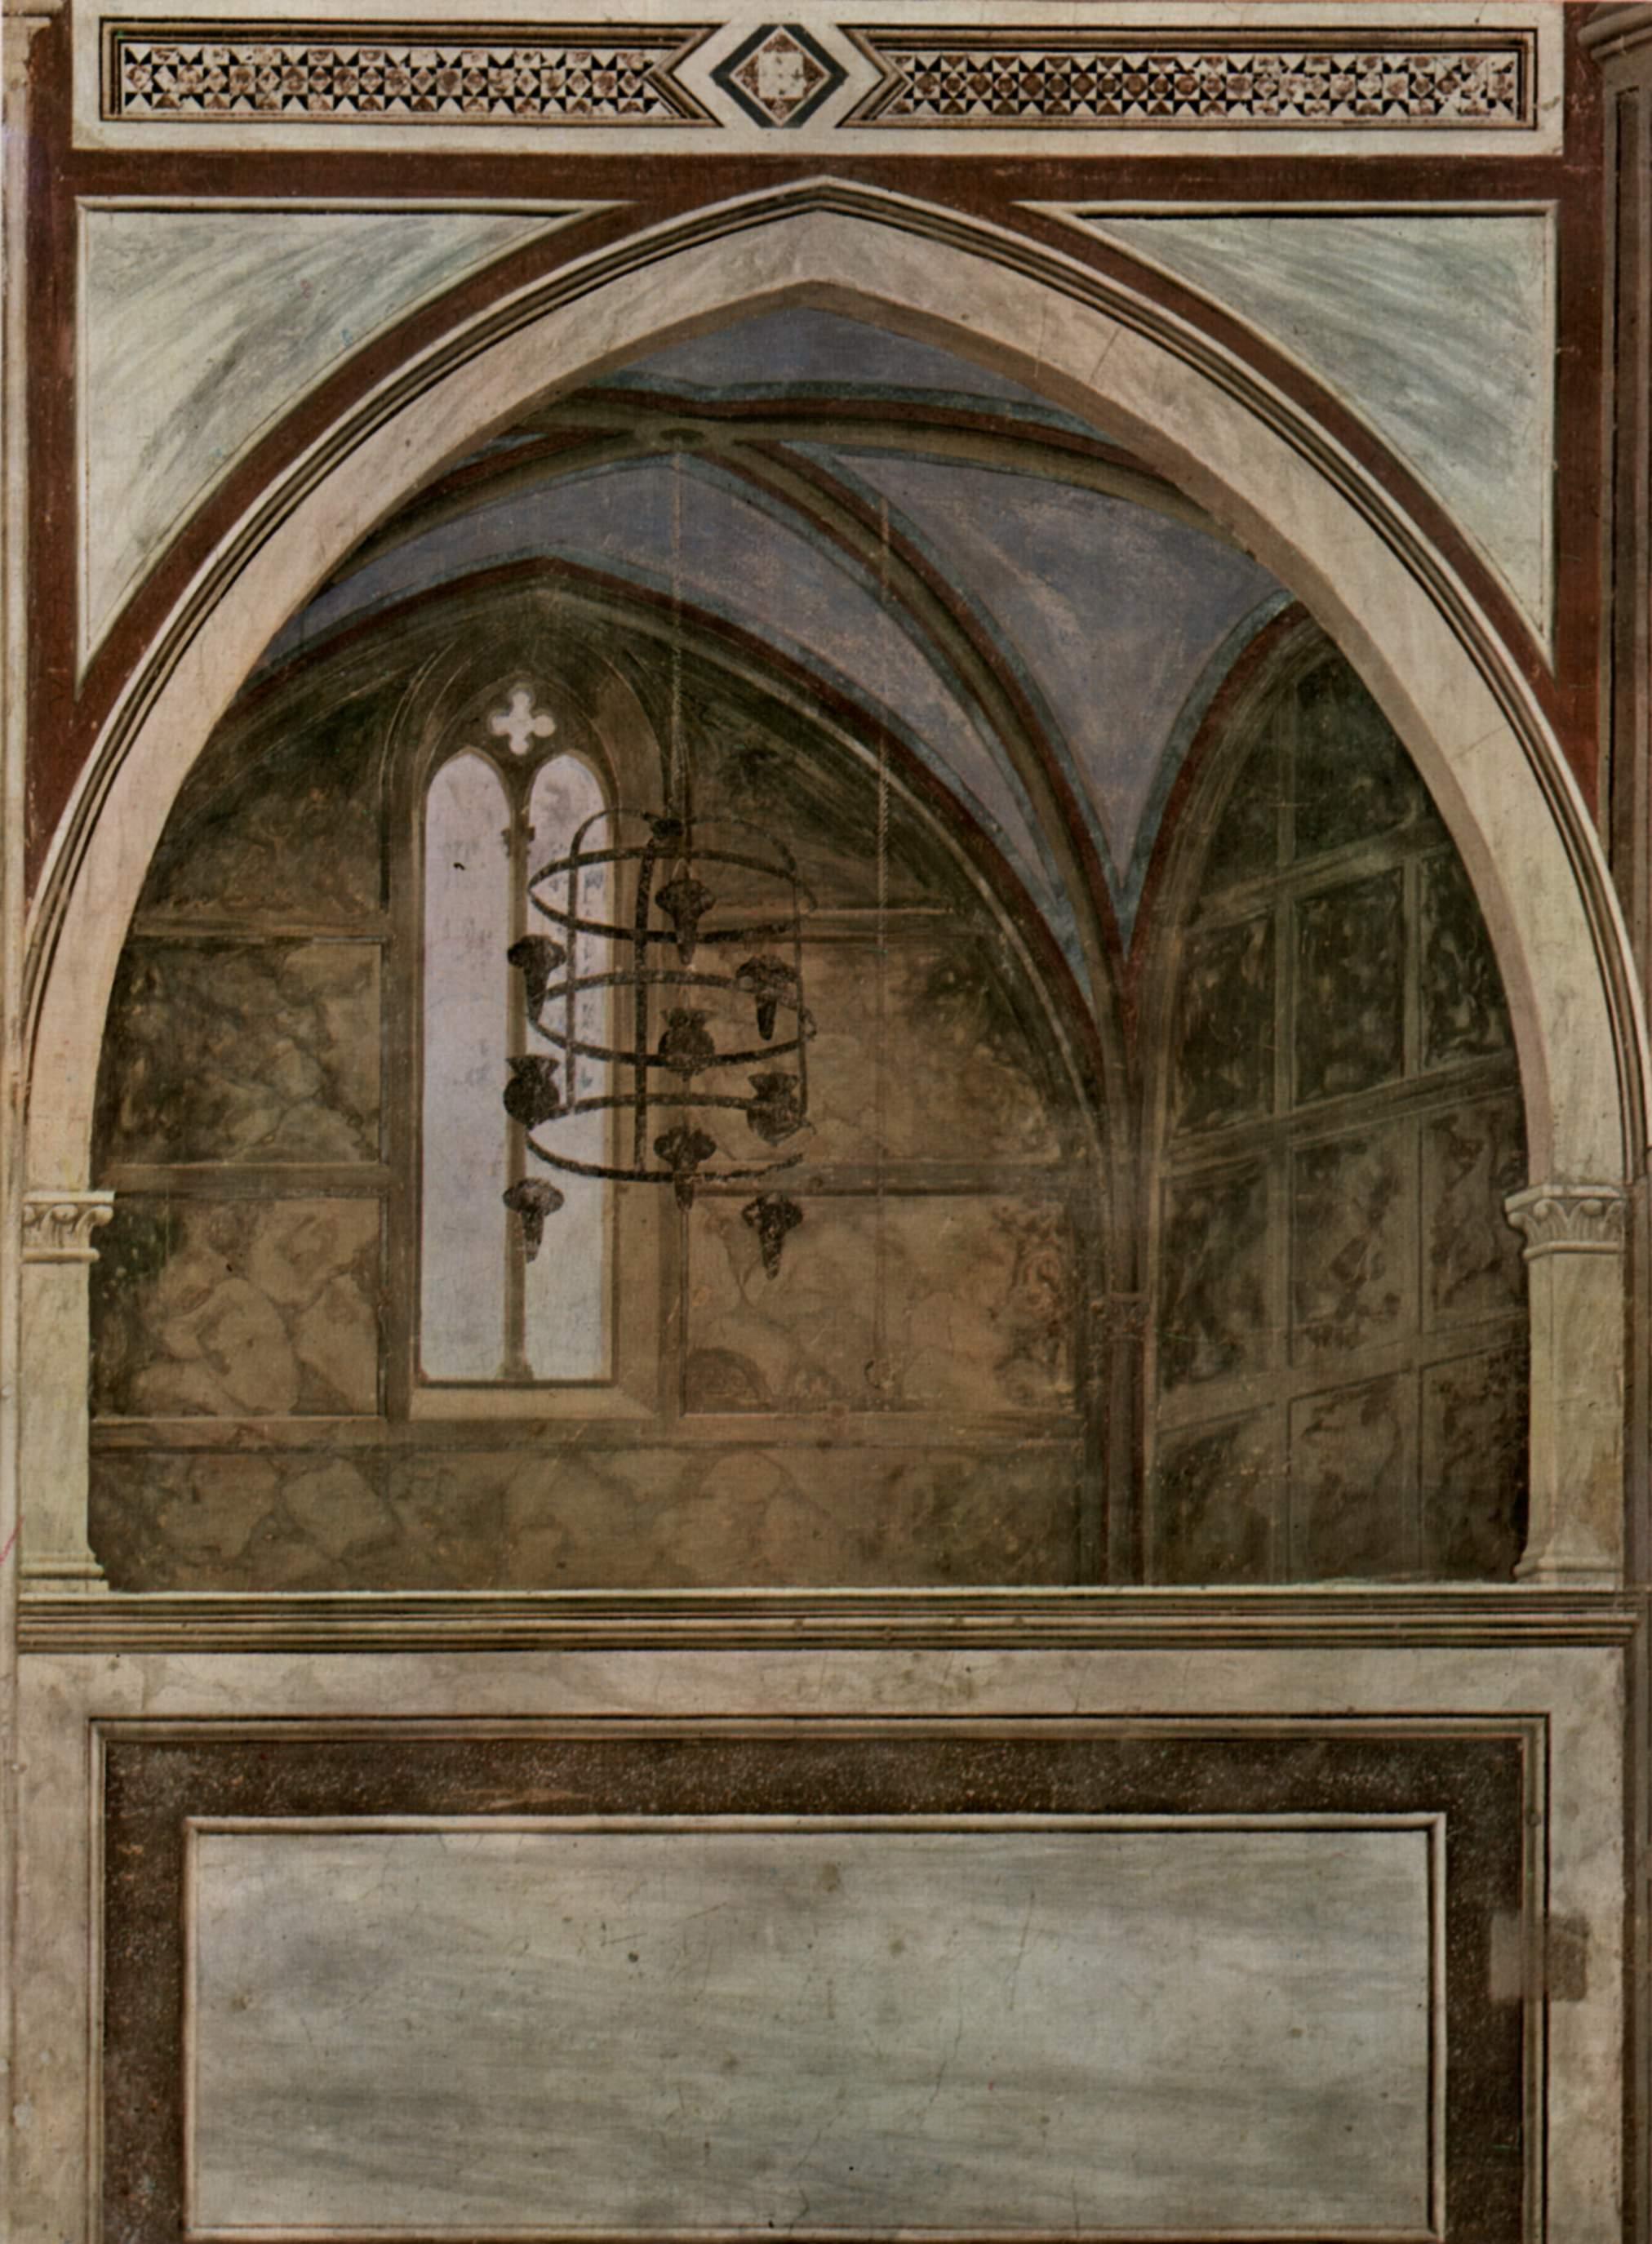 Цикл фресок из жизни св. Франциска, капелла Барди [12]. Санта Кроче во Флоренции. Кончина св. Франци, Джотто ди Бондоне